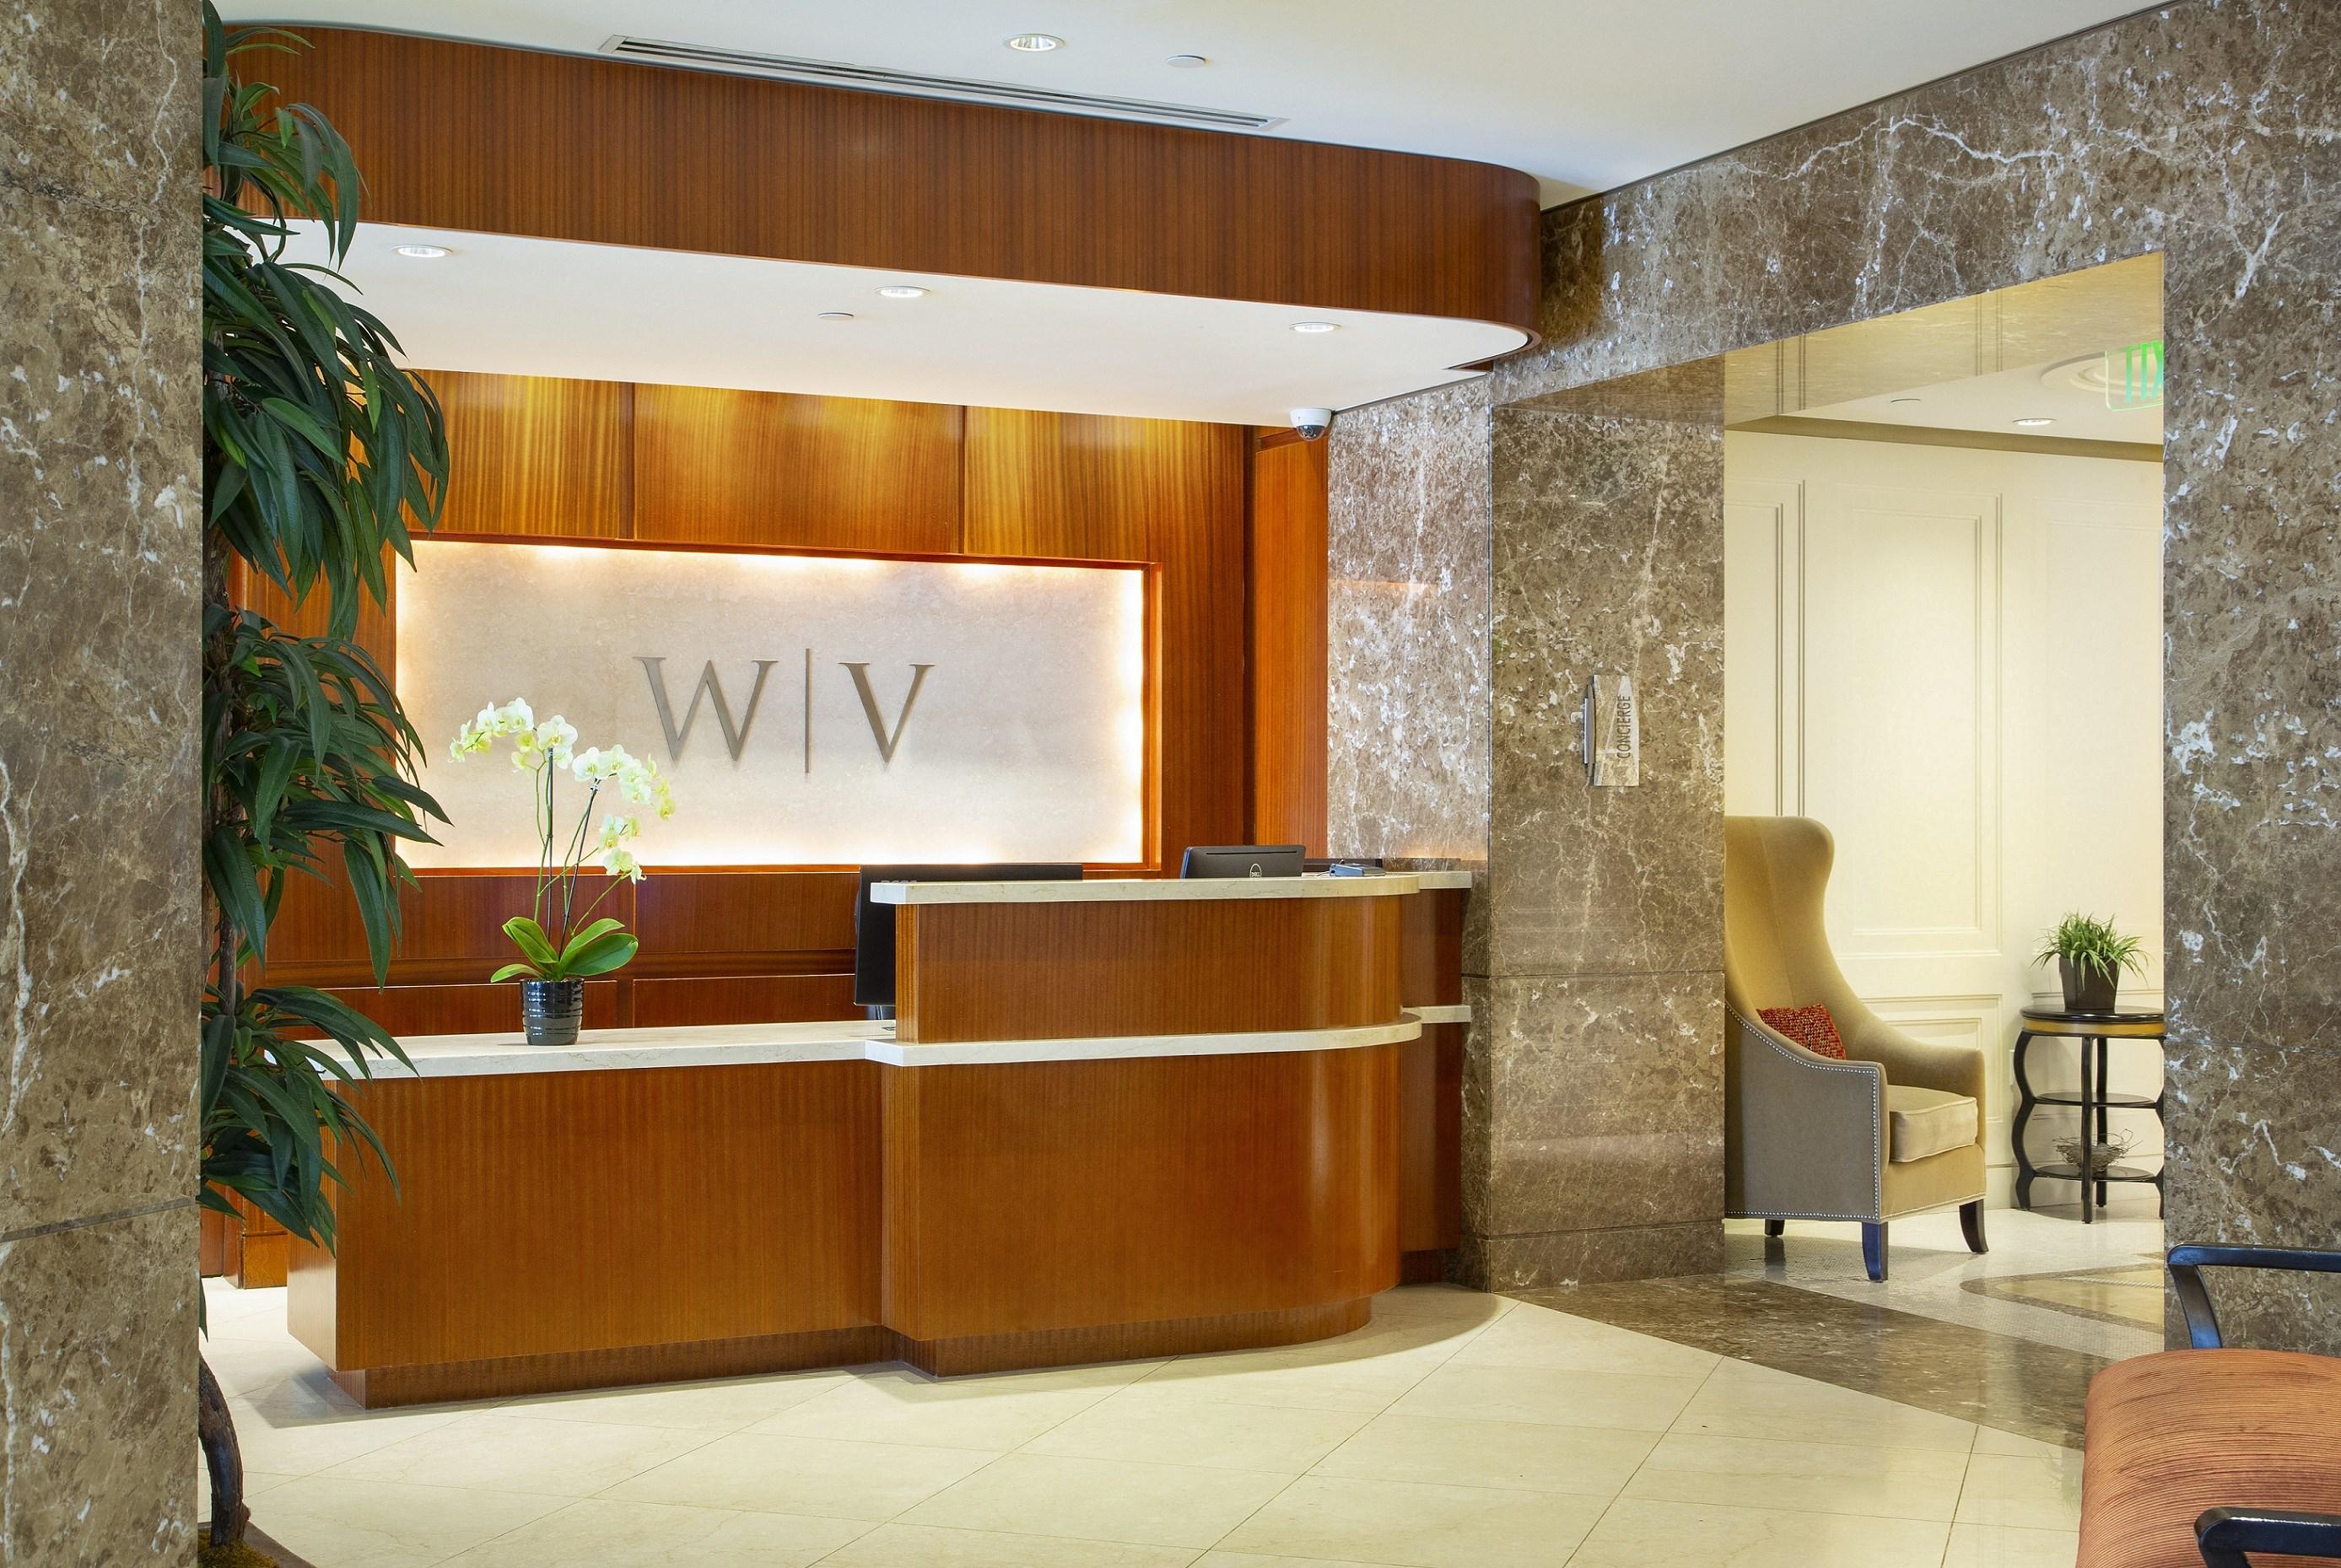 Westwood-Luxury-Apartments-Wilshire-Victoria-Interior-24-hour-concierge-product